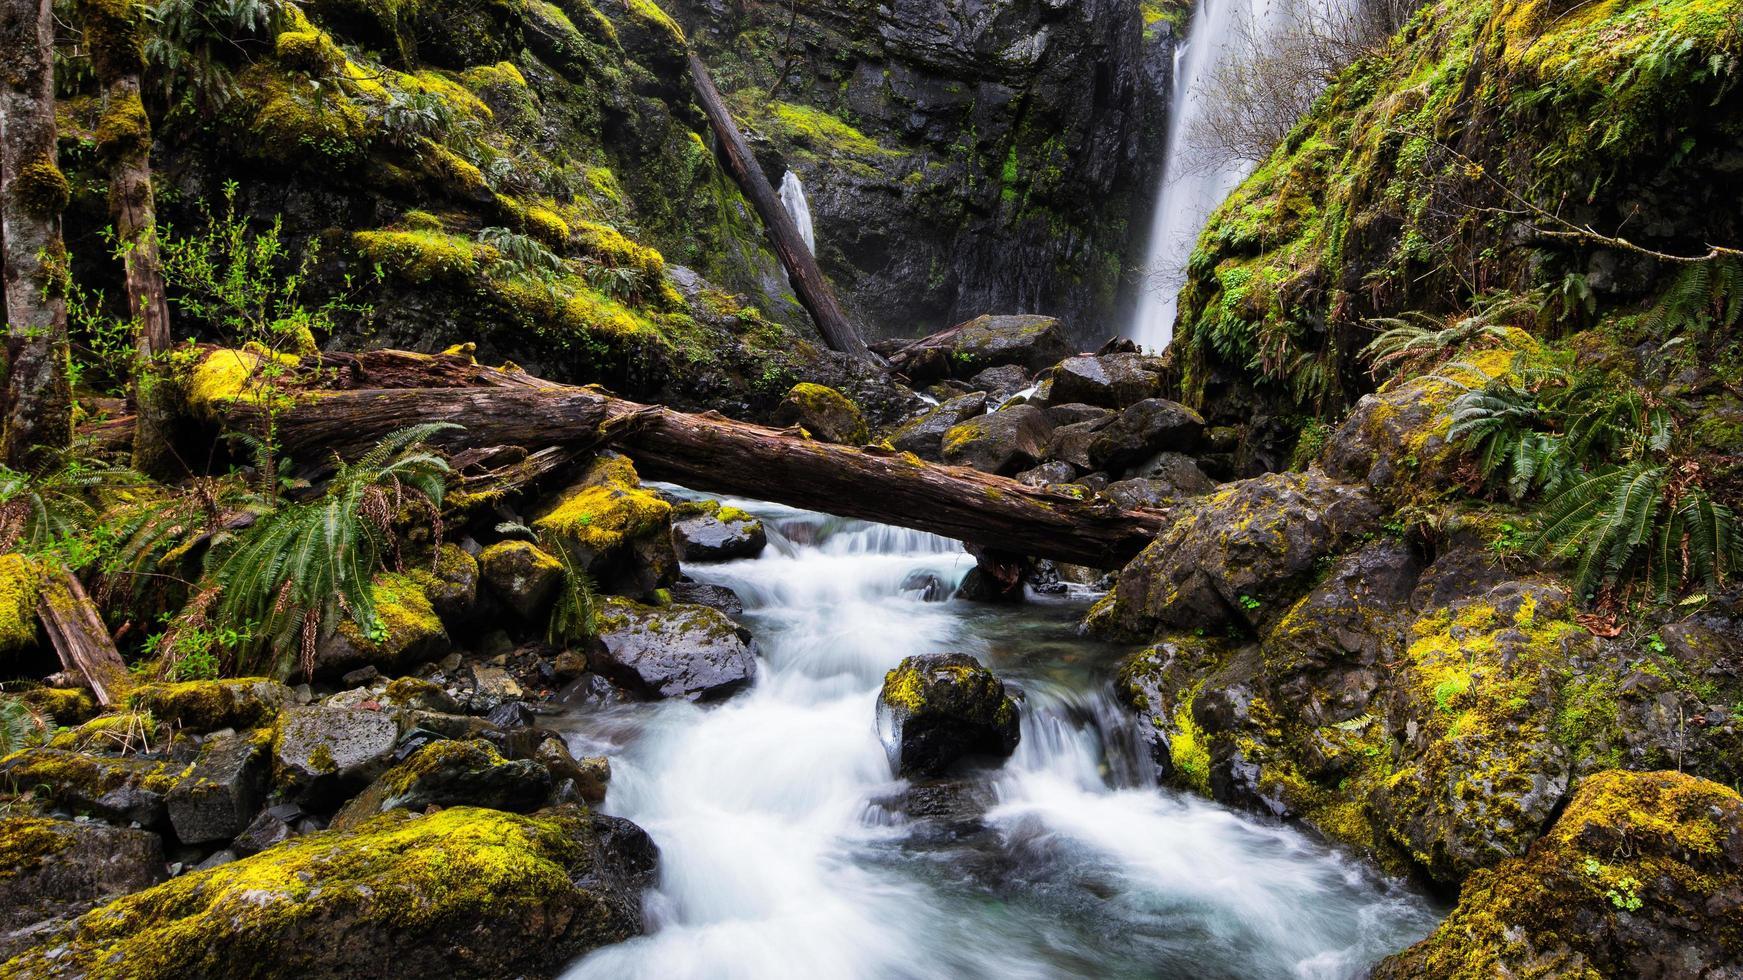 Waterfall river between rocks photo